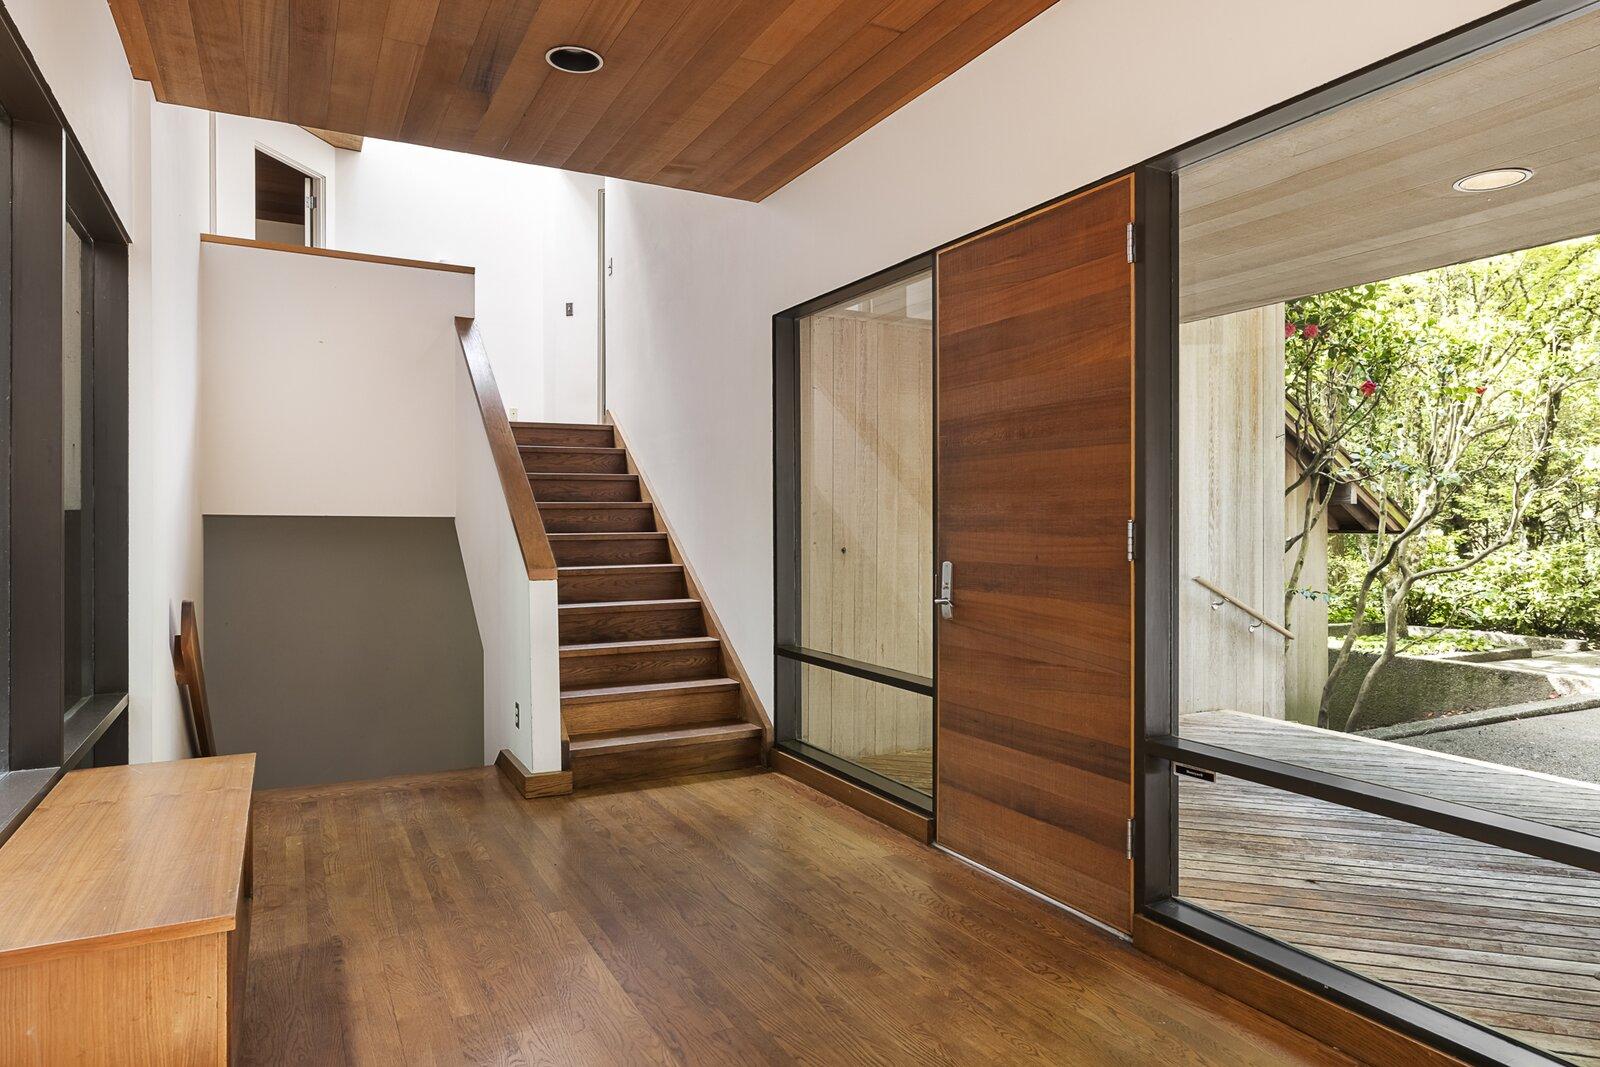 Entryway of the Mason Residence by Saul Zaik